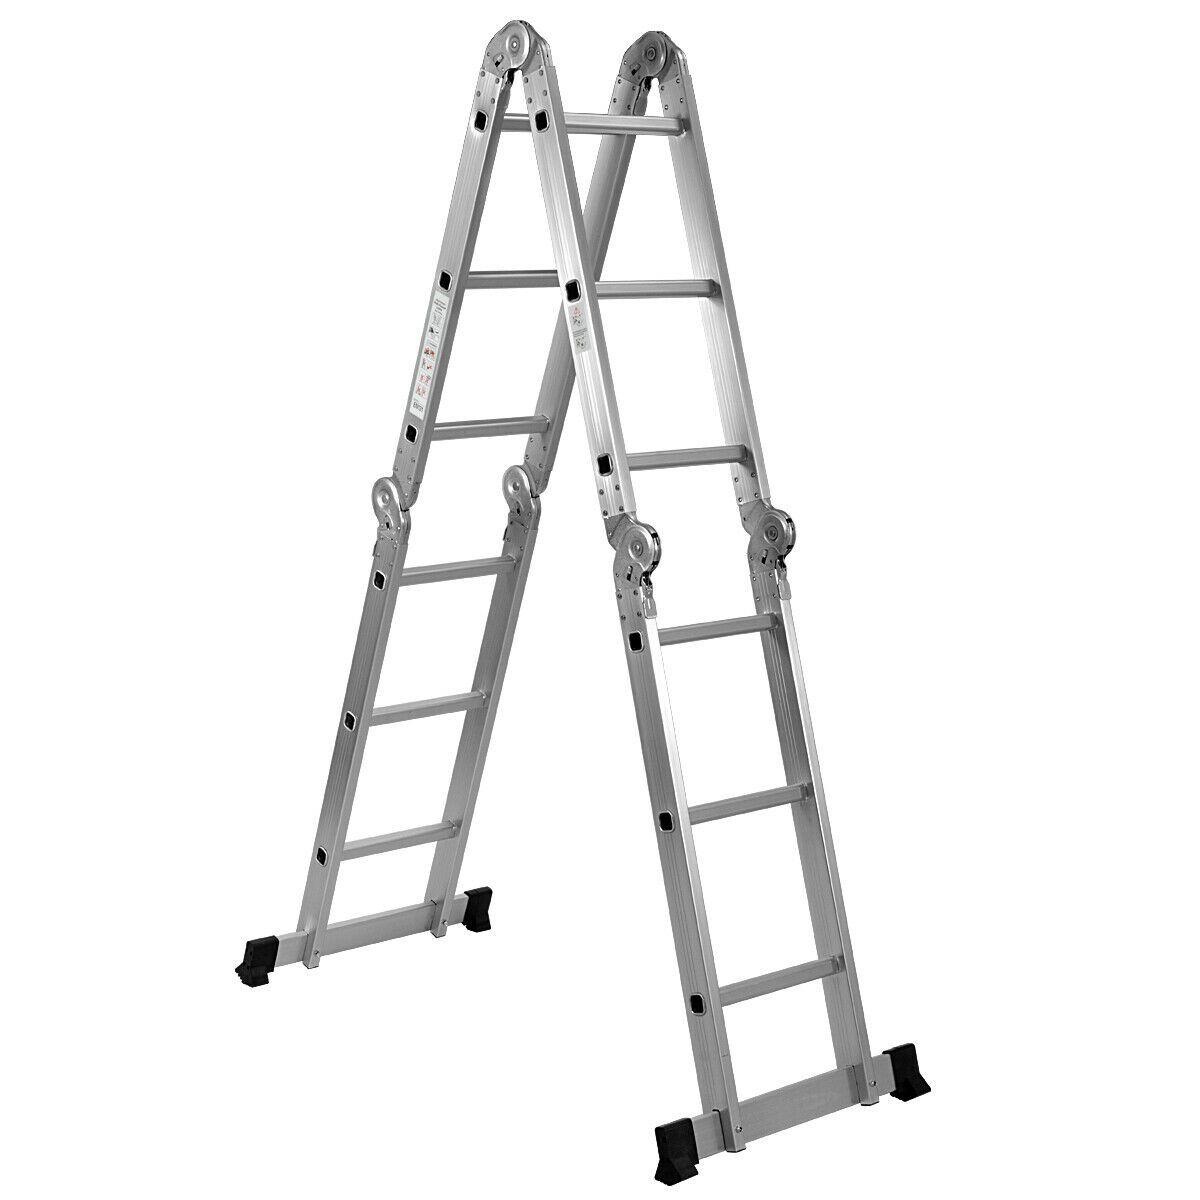 12 5 12 Step Multi Purpose Aluminum Folding Scaffold Ladder Ladders Scaffolding Scaffolding Ladder